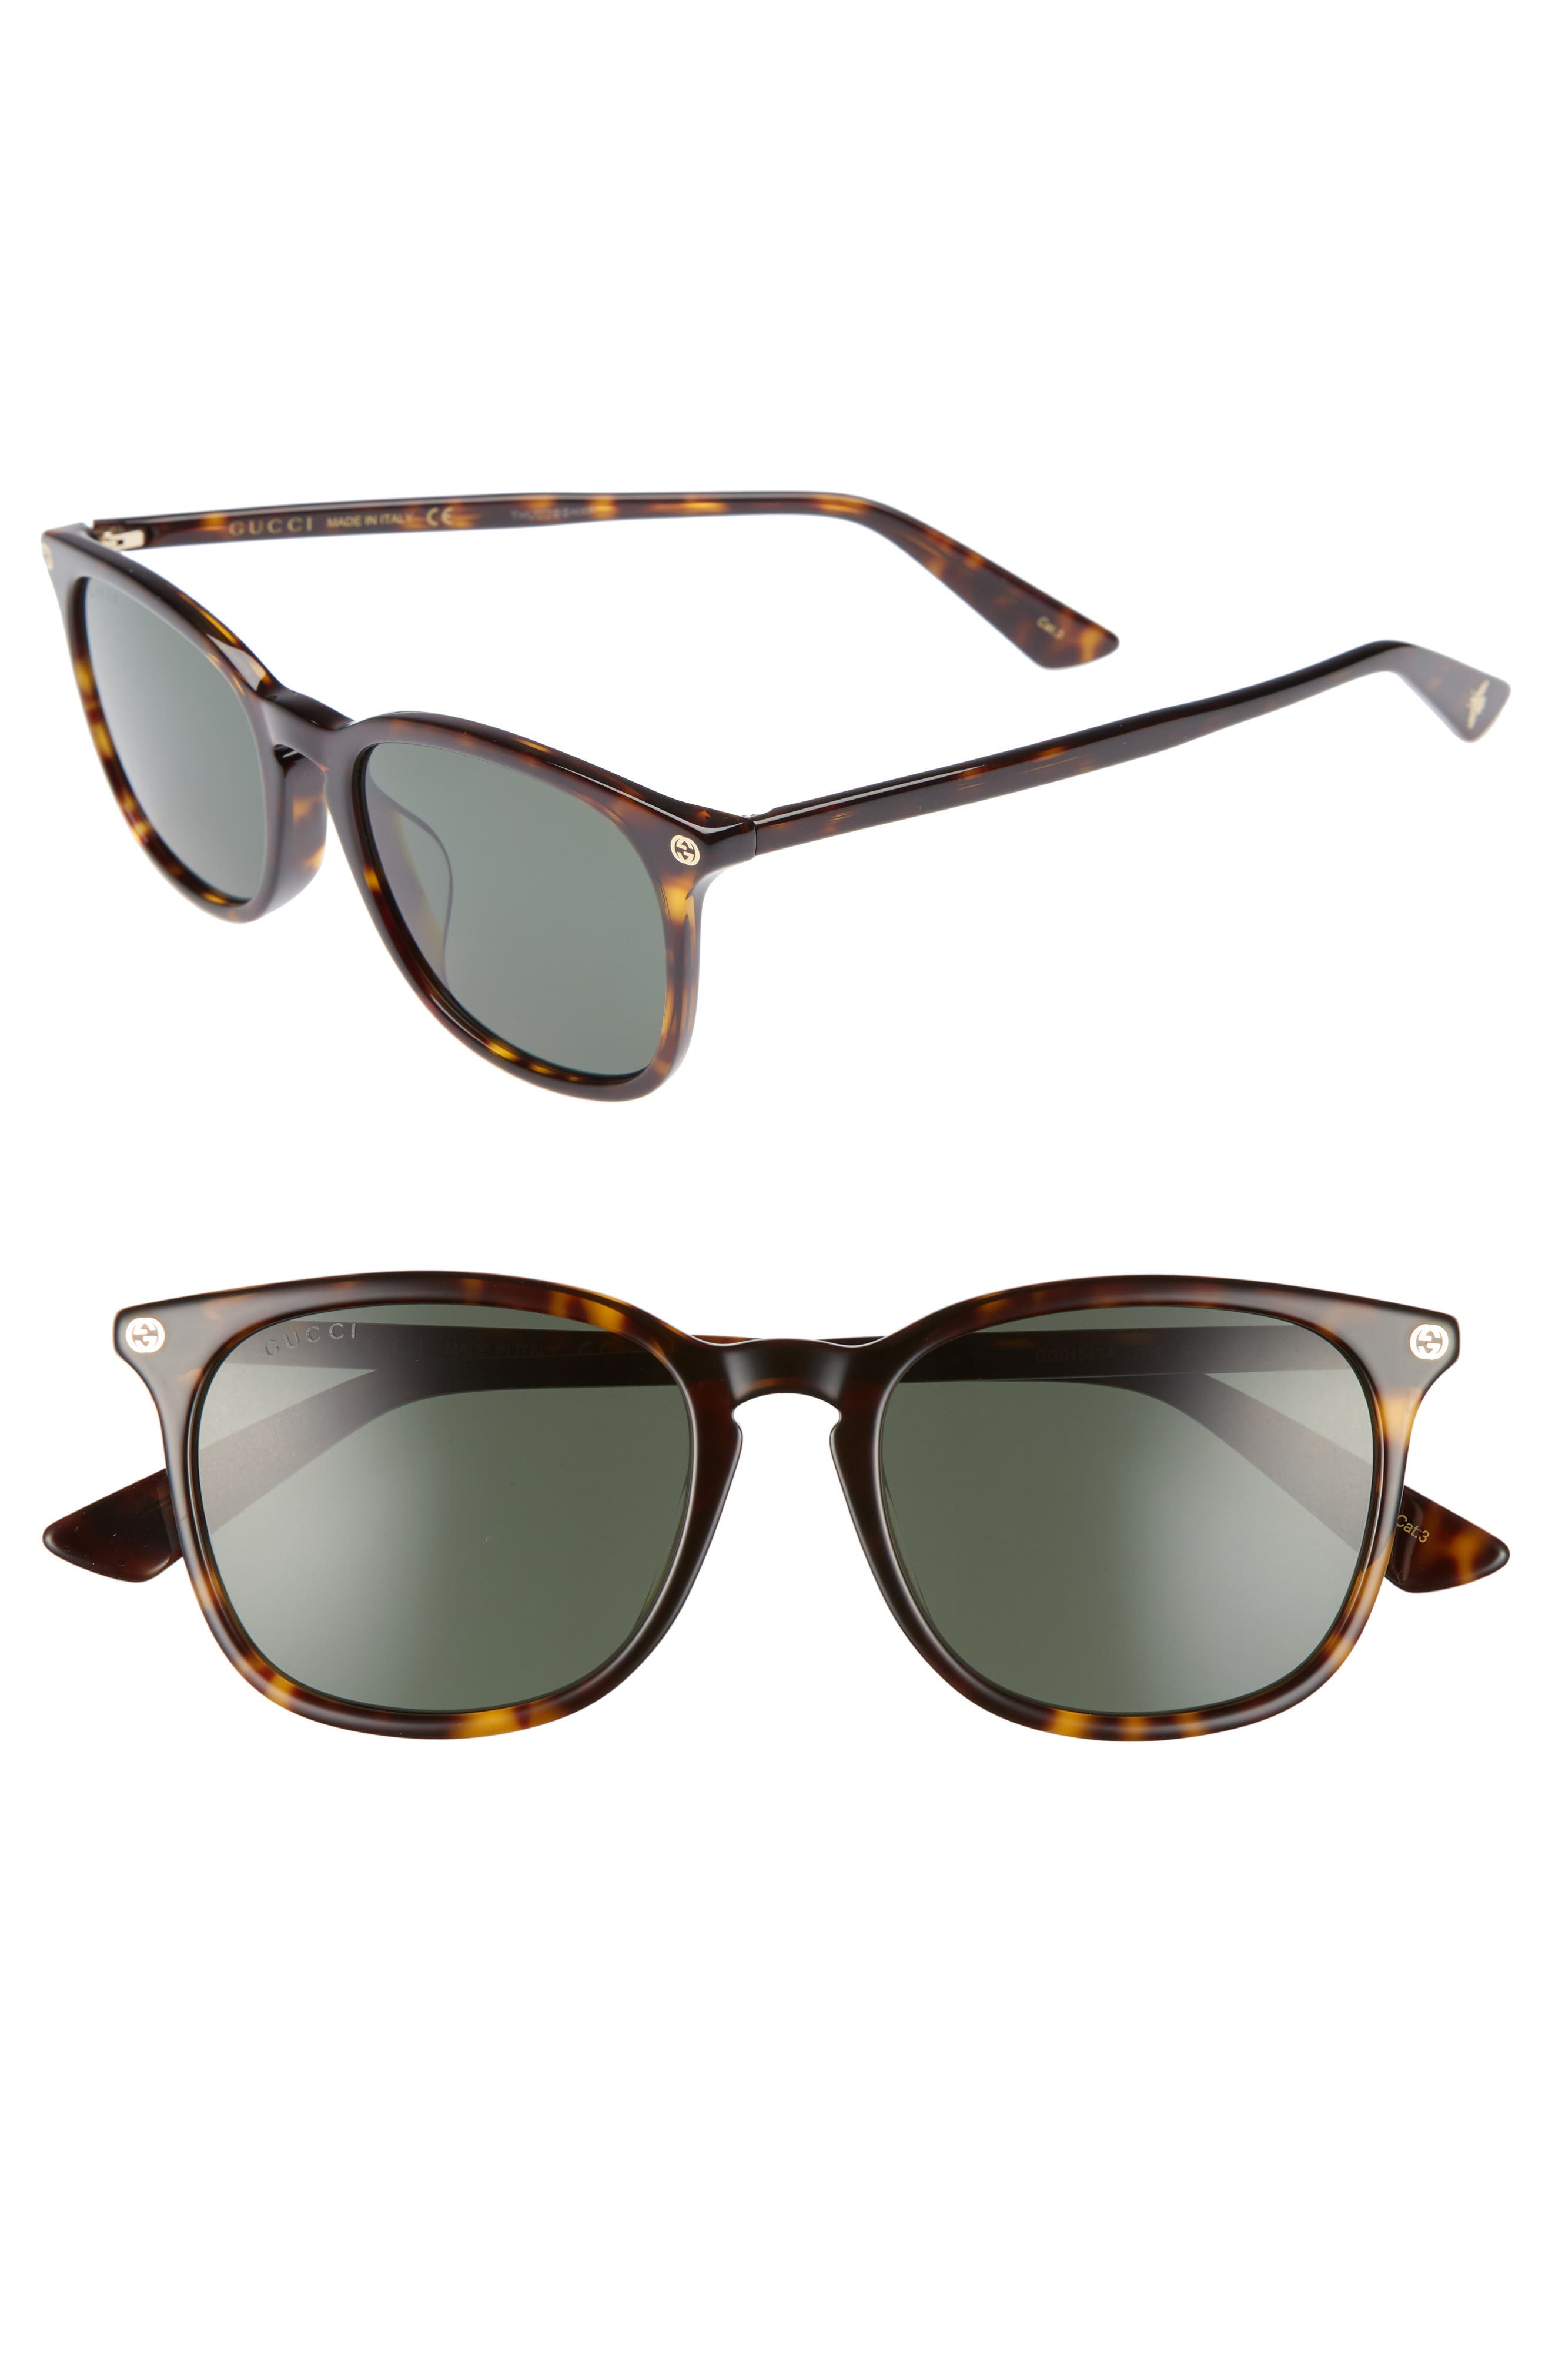 7ecf061e22568 Men s Gucci Sunglasses   Eyeglasses